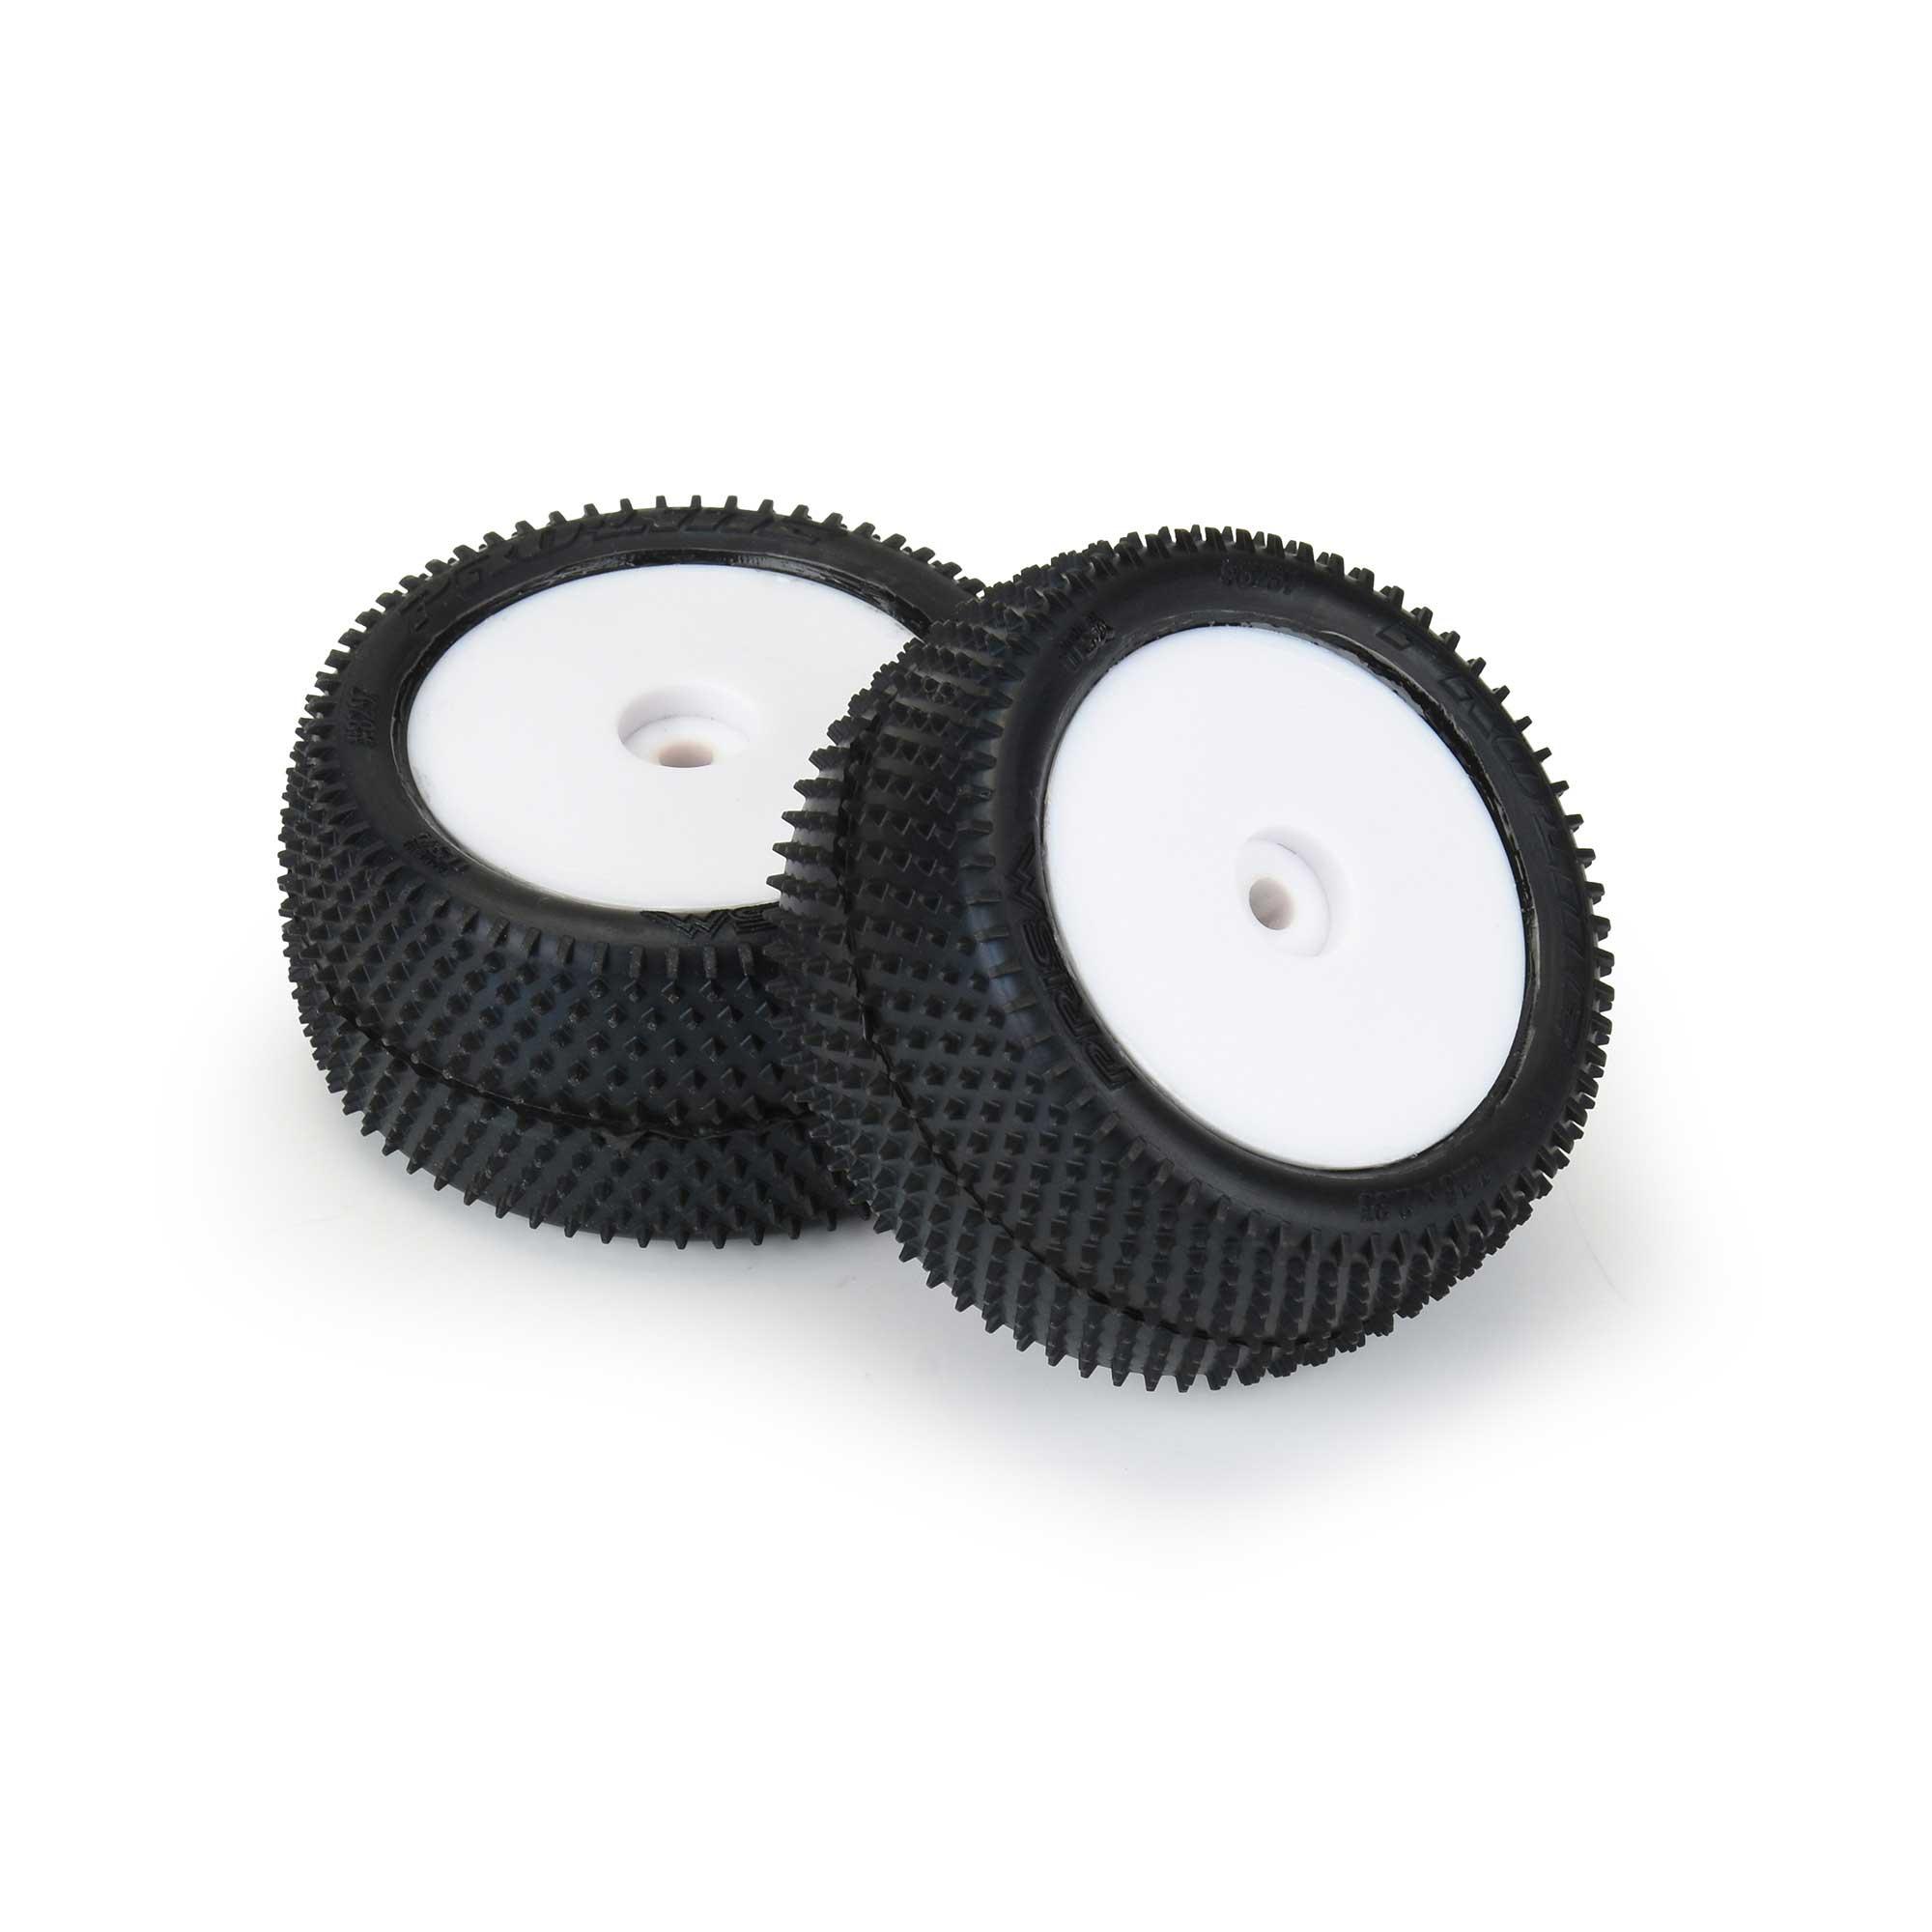 1/18 Prism Rear Carpet Mini-B Tires Mounted 8mm White Wheels (2)